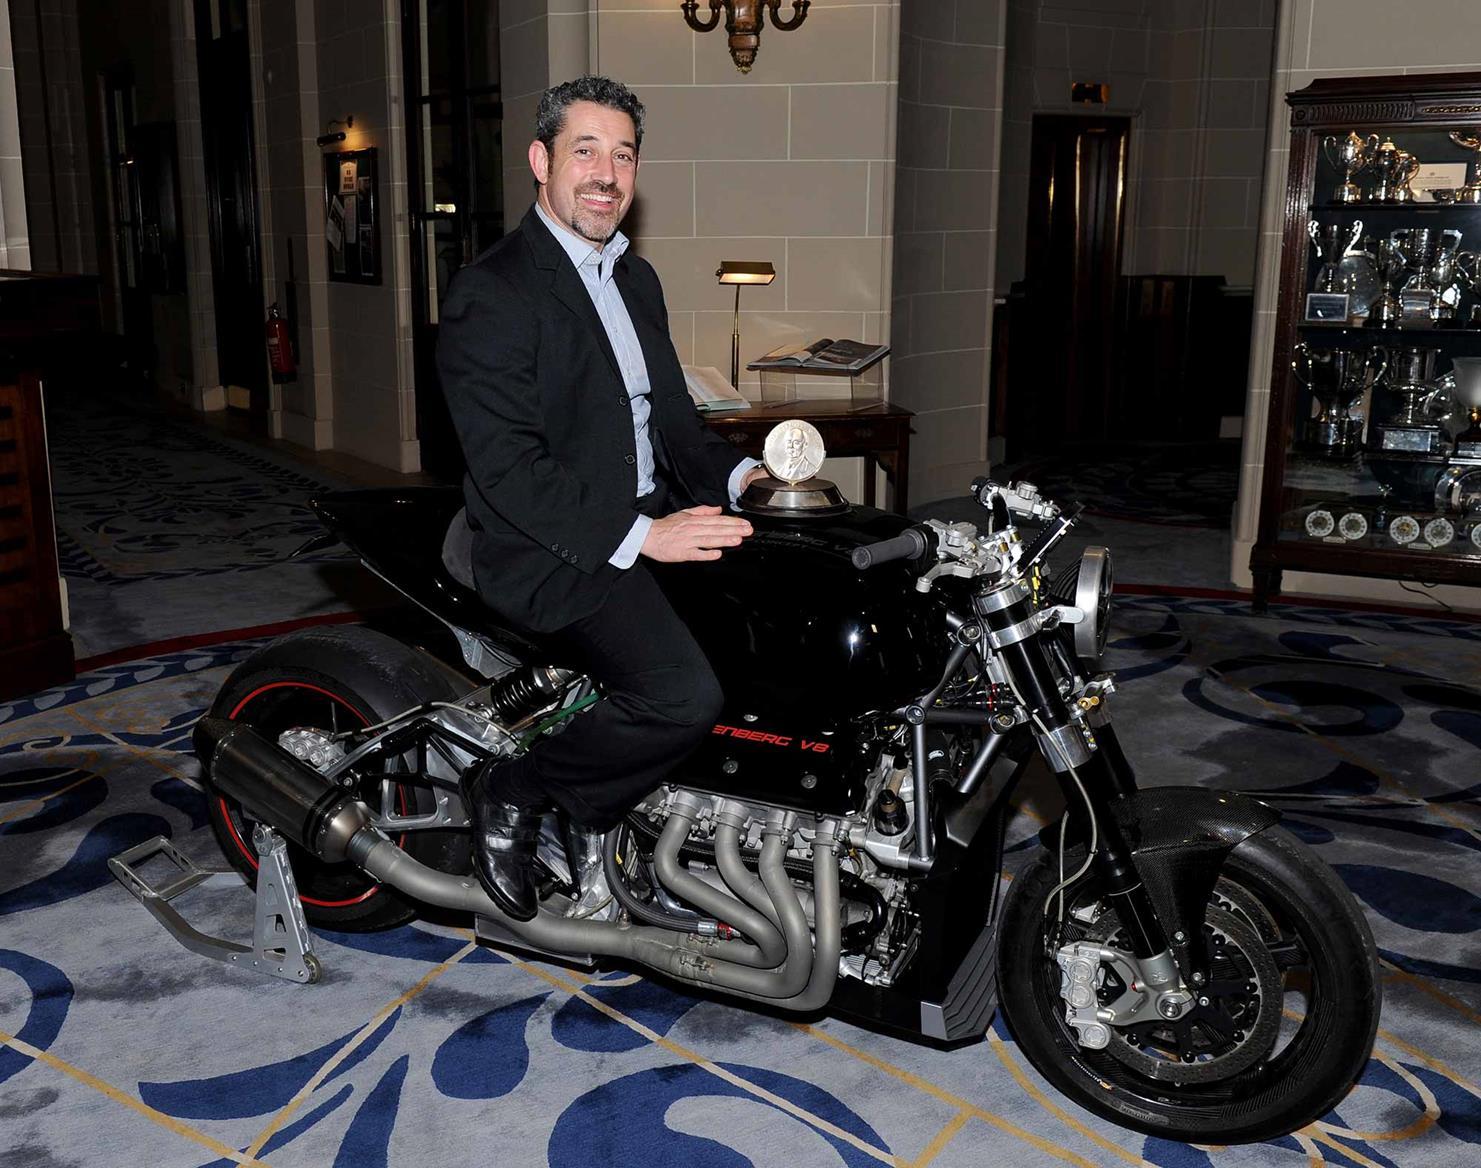 Eisenberg sits on his V8 motorcycle